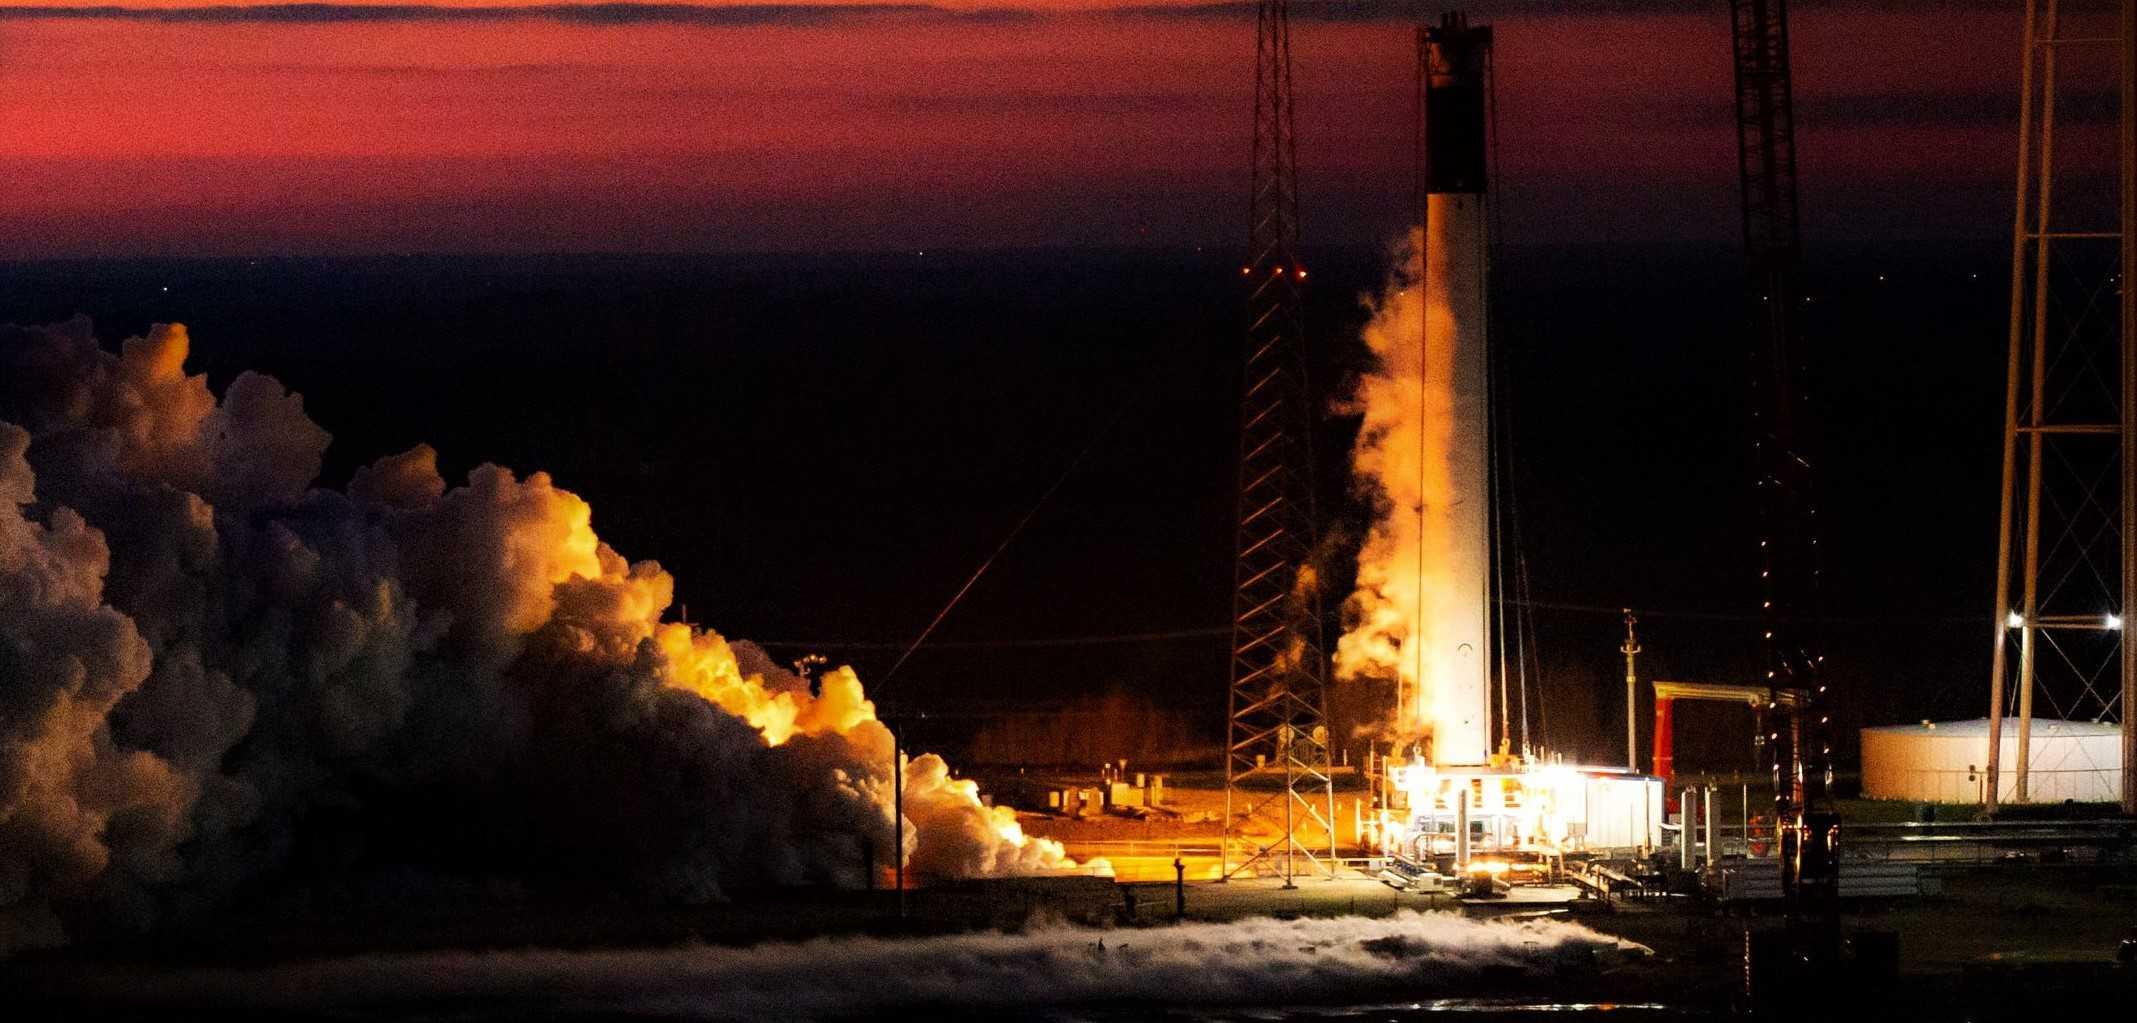 Falcon 9 B106x GPS III SV03 McGregor static fire 021320 (SpaceX) 1 crop 3 edit (c)